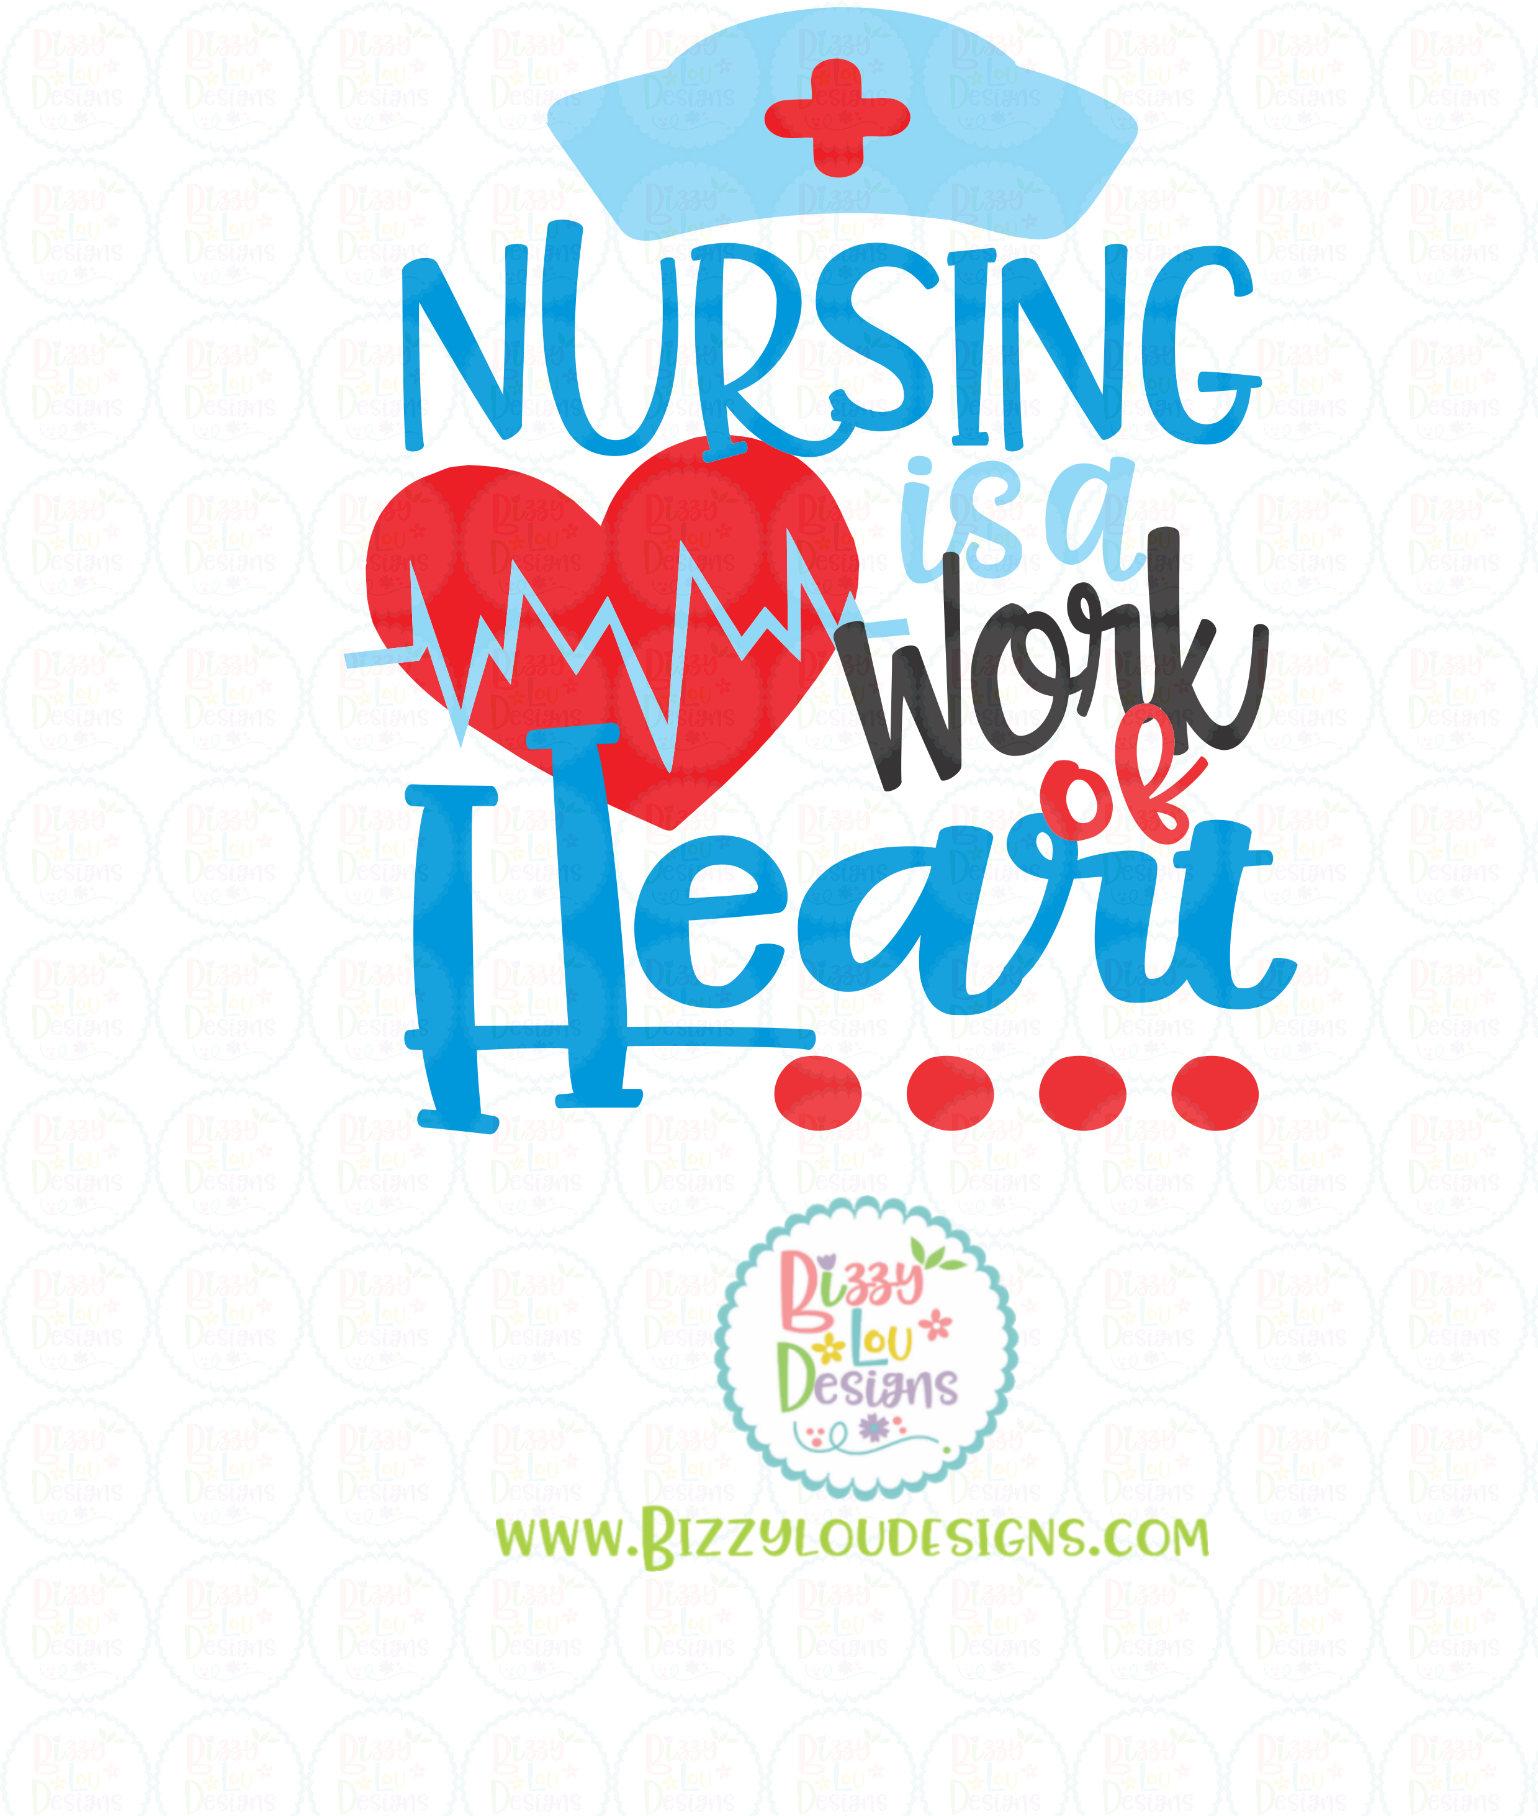 Nursing Quotes Nursing Svg Dxf Eps Png Nurse Svg Nurse Cut File Nursing